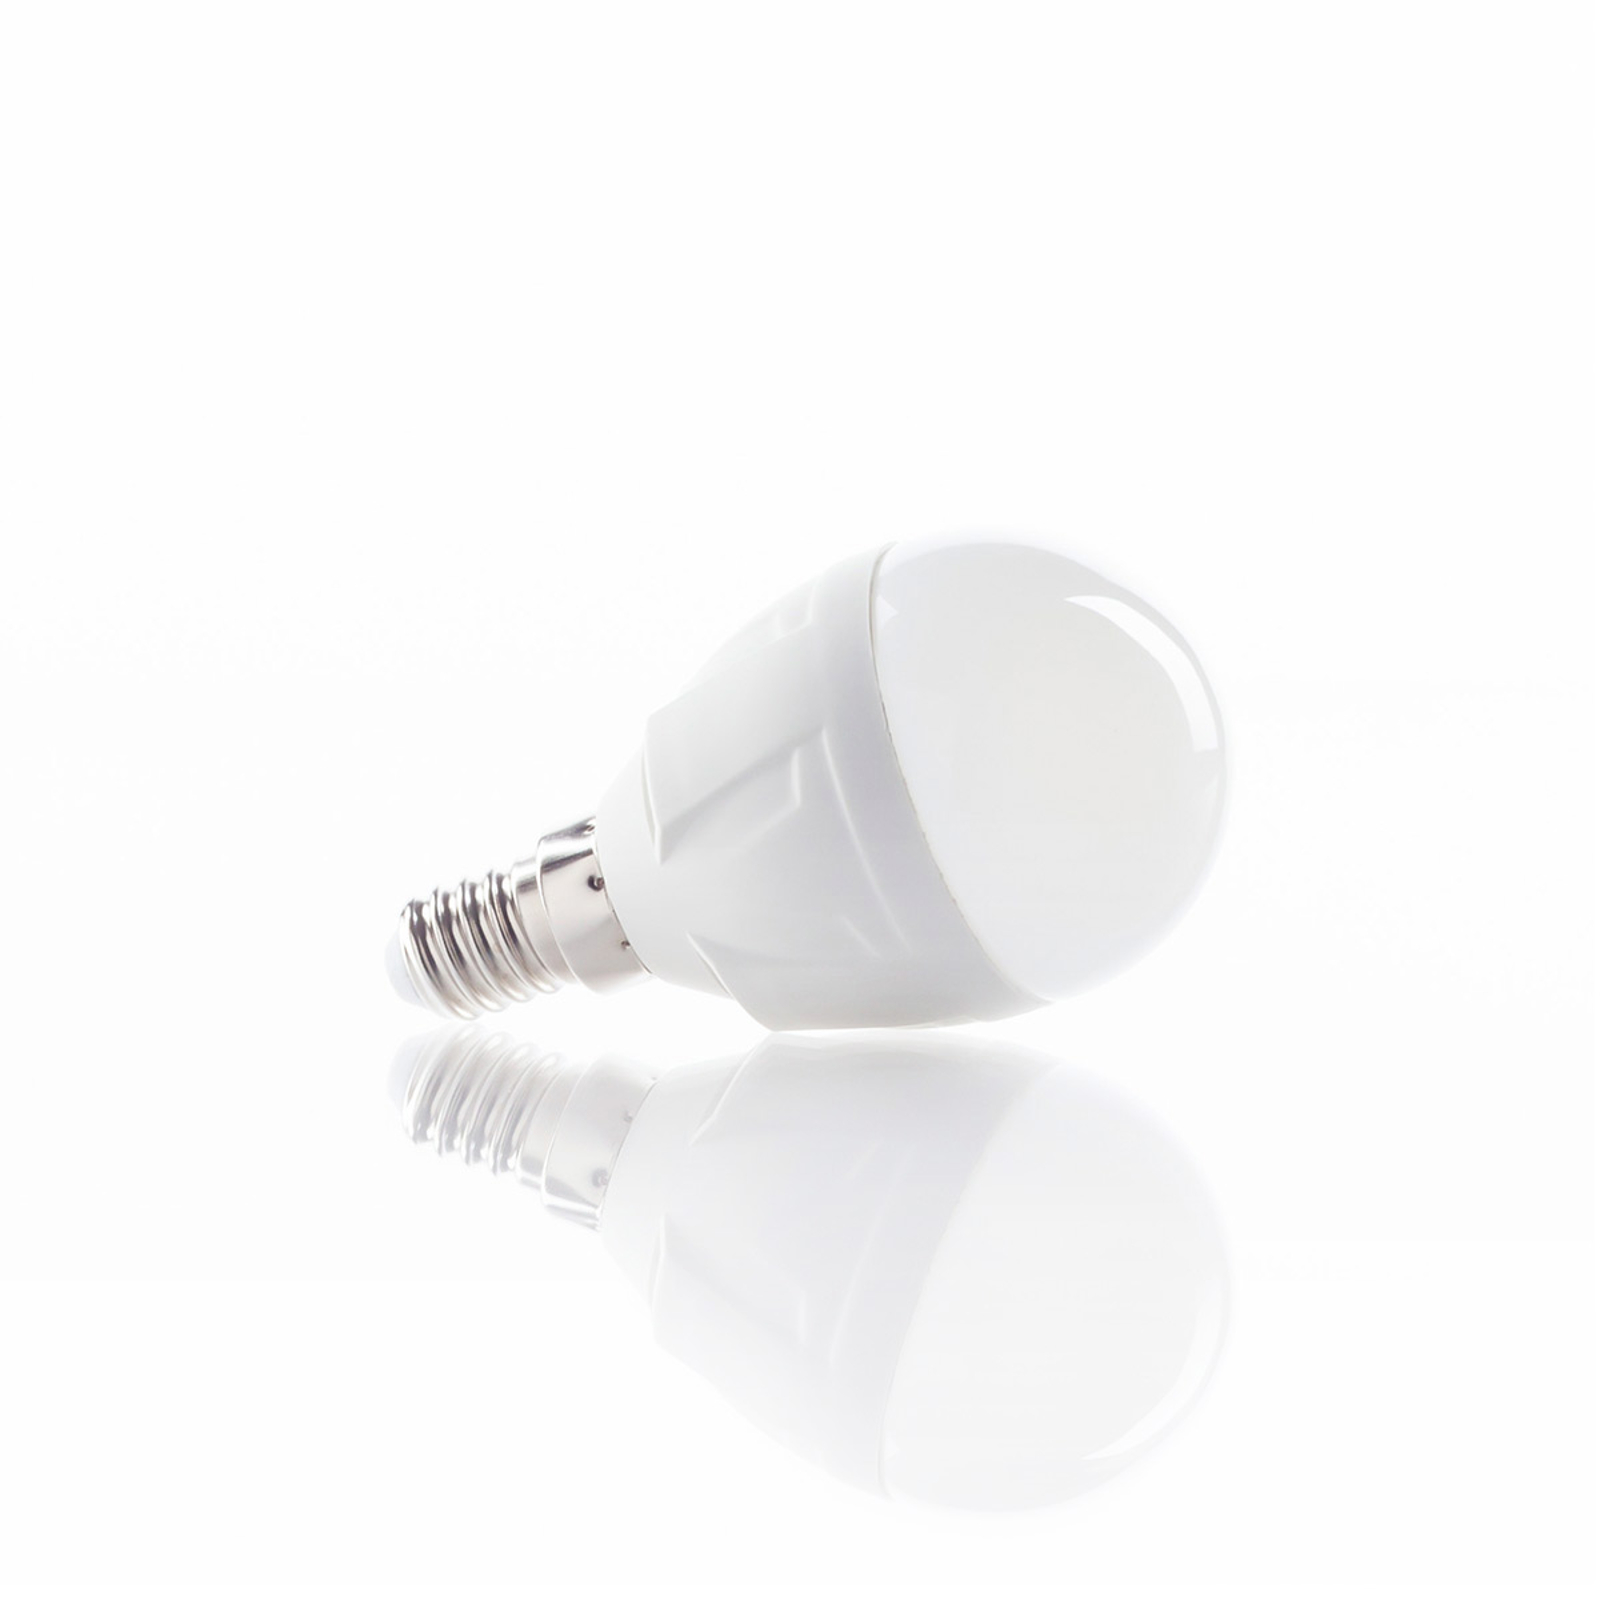 E14 4,9W 830 bombilla LED forma gota blanco cálido